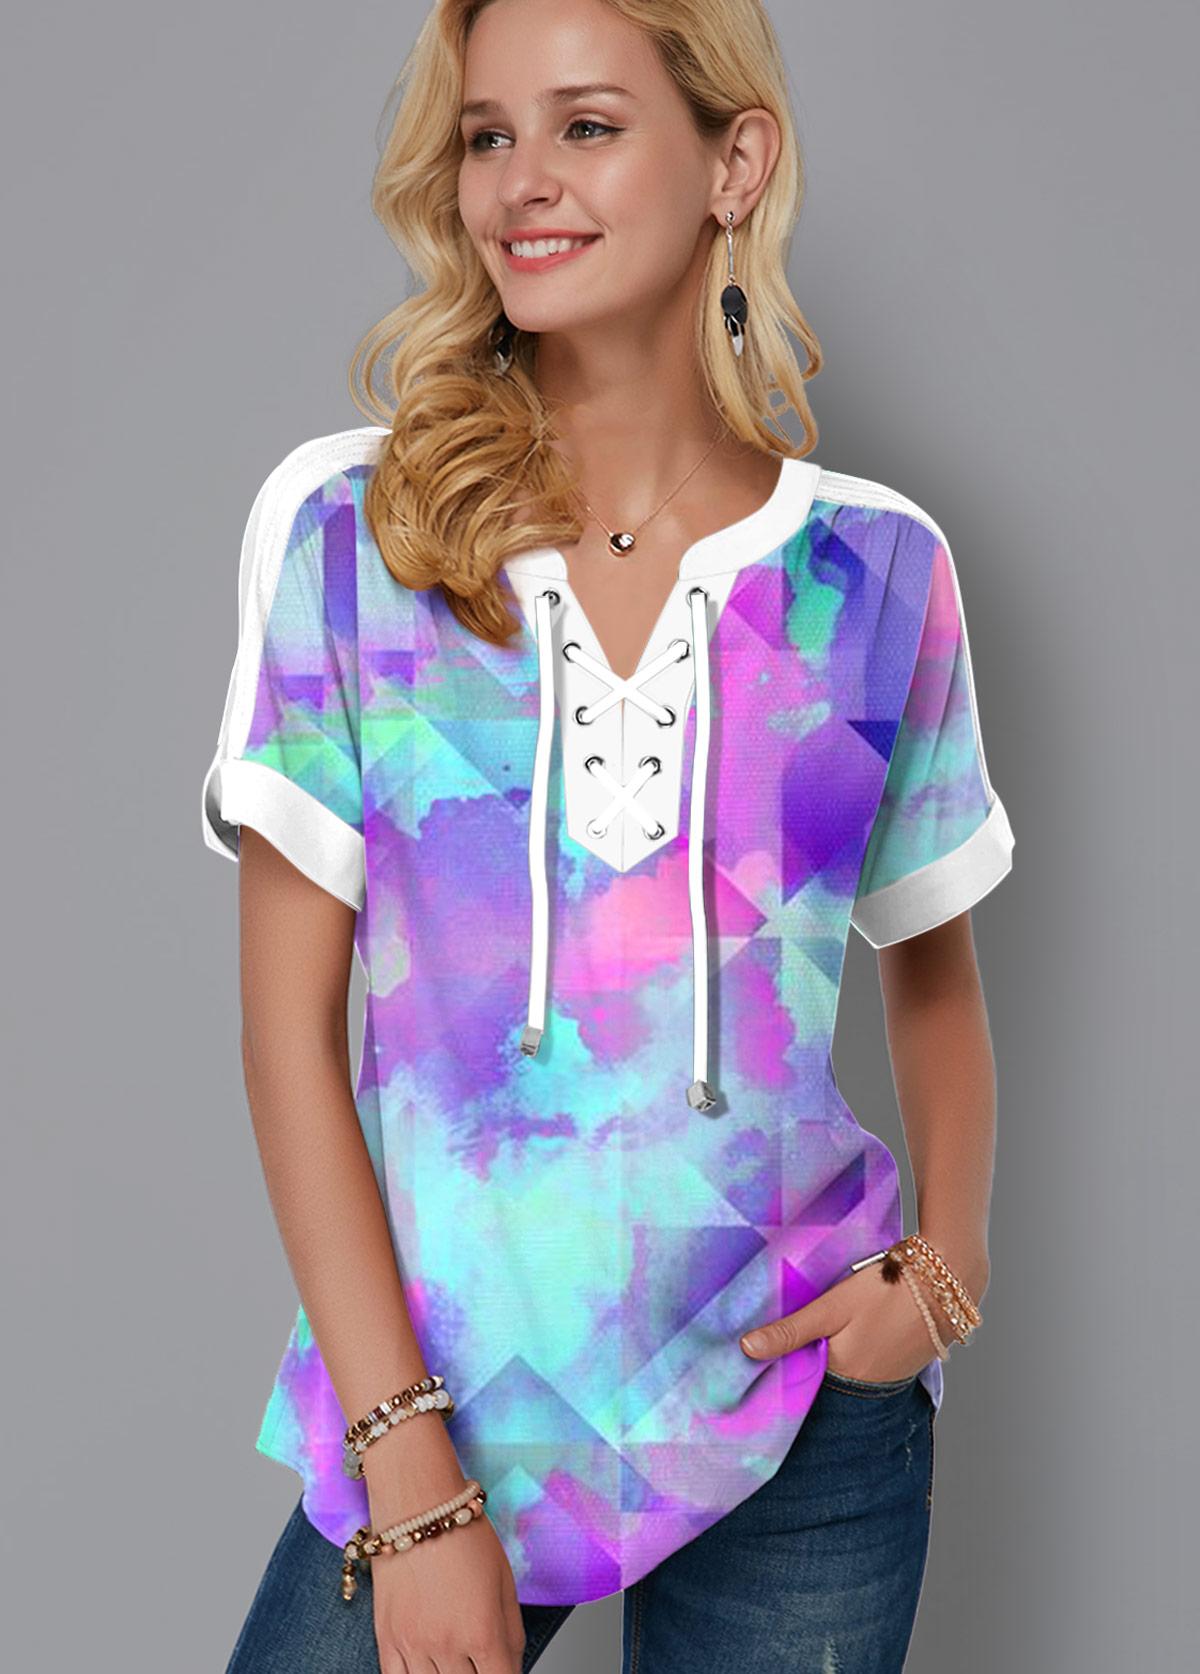 ROTITA Lace Up Tie Dye Print Short Sleeve Blouse